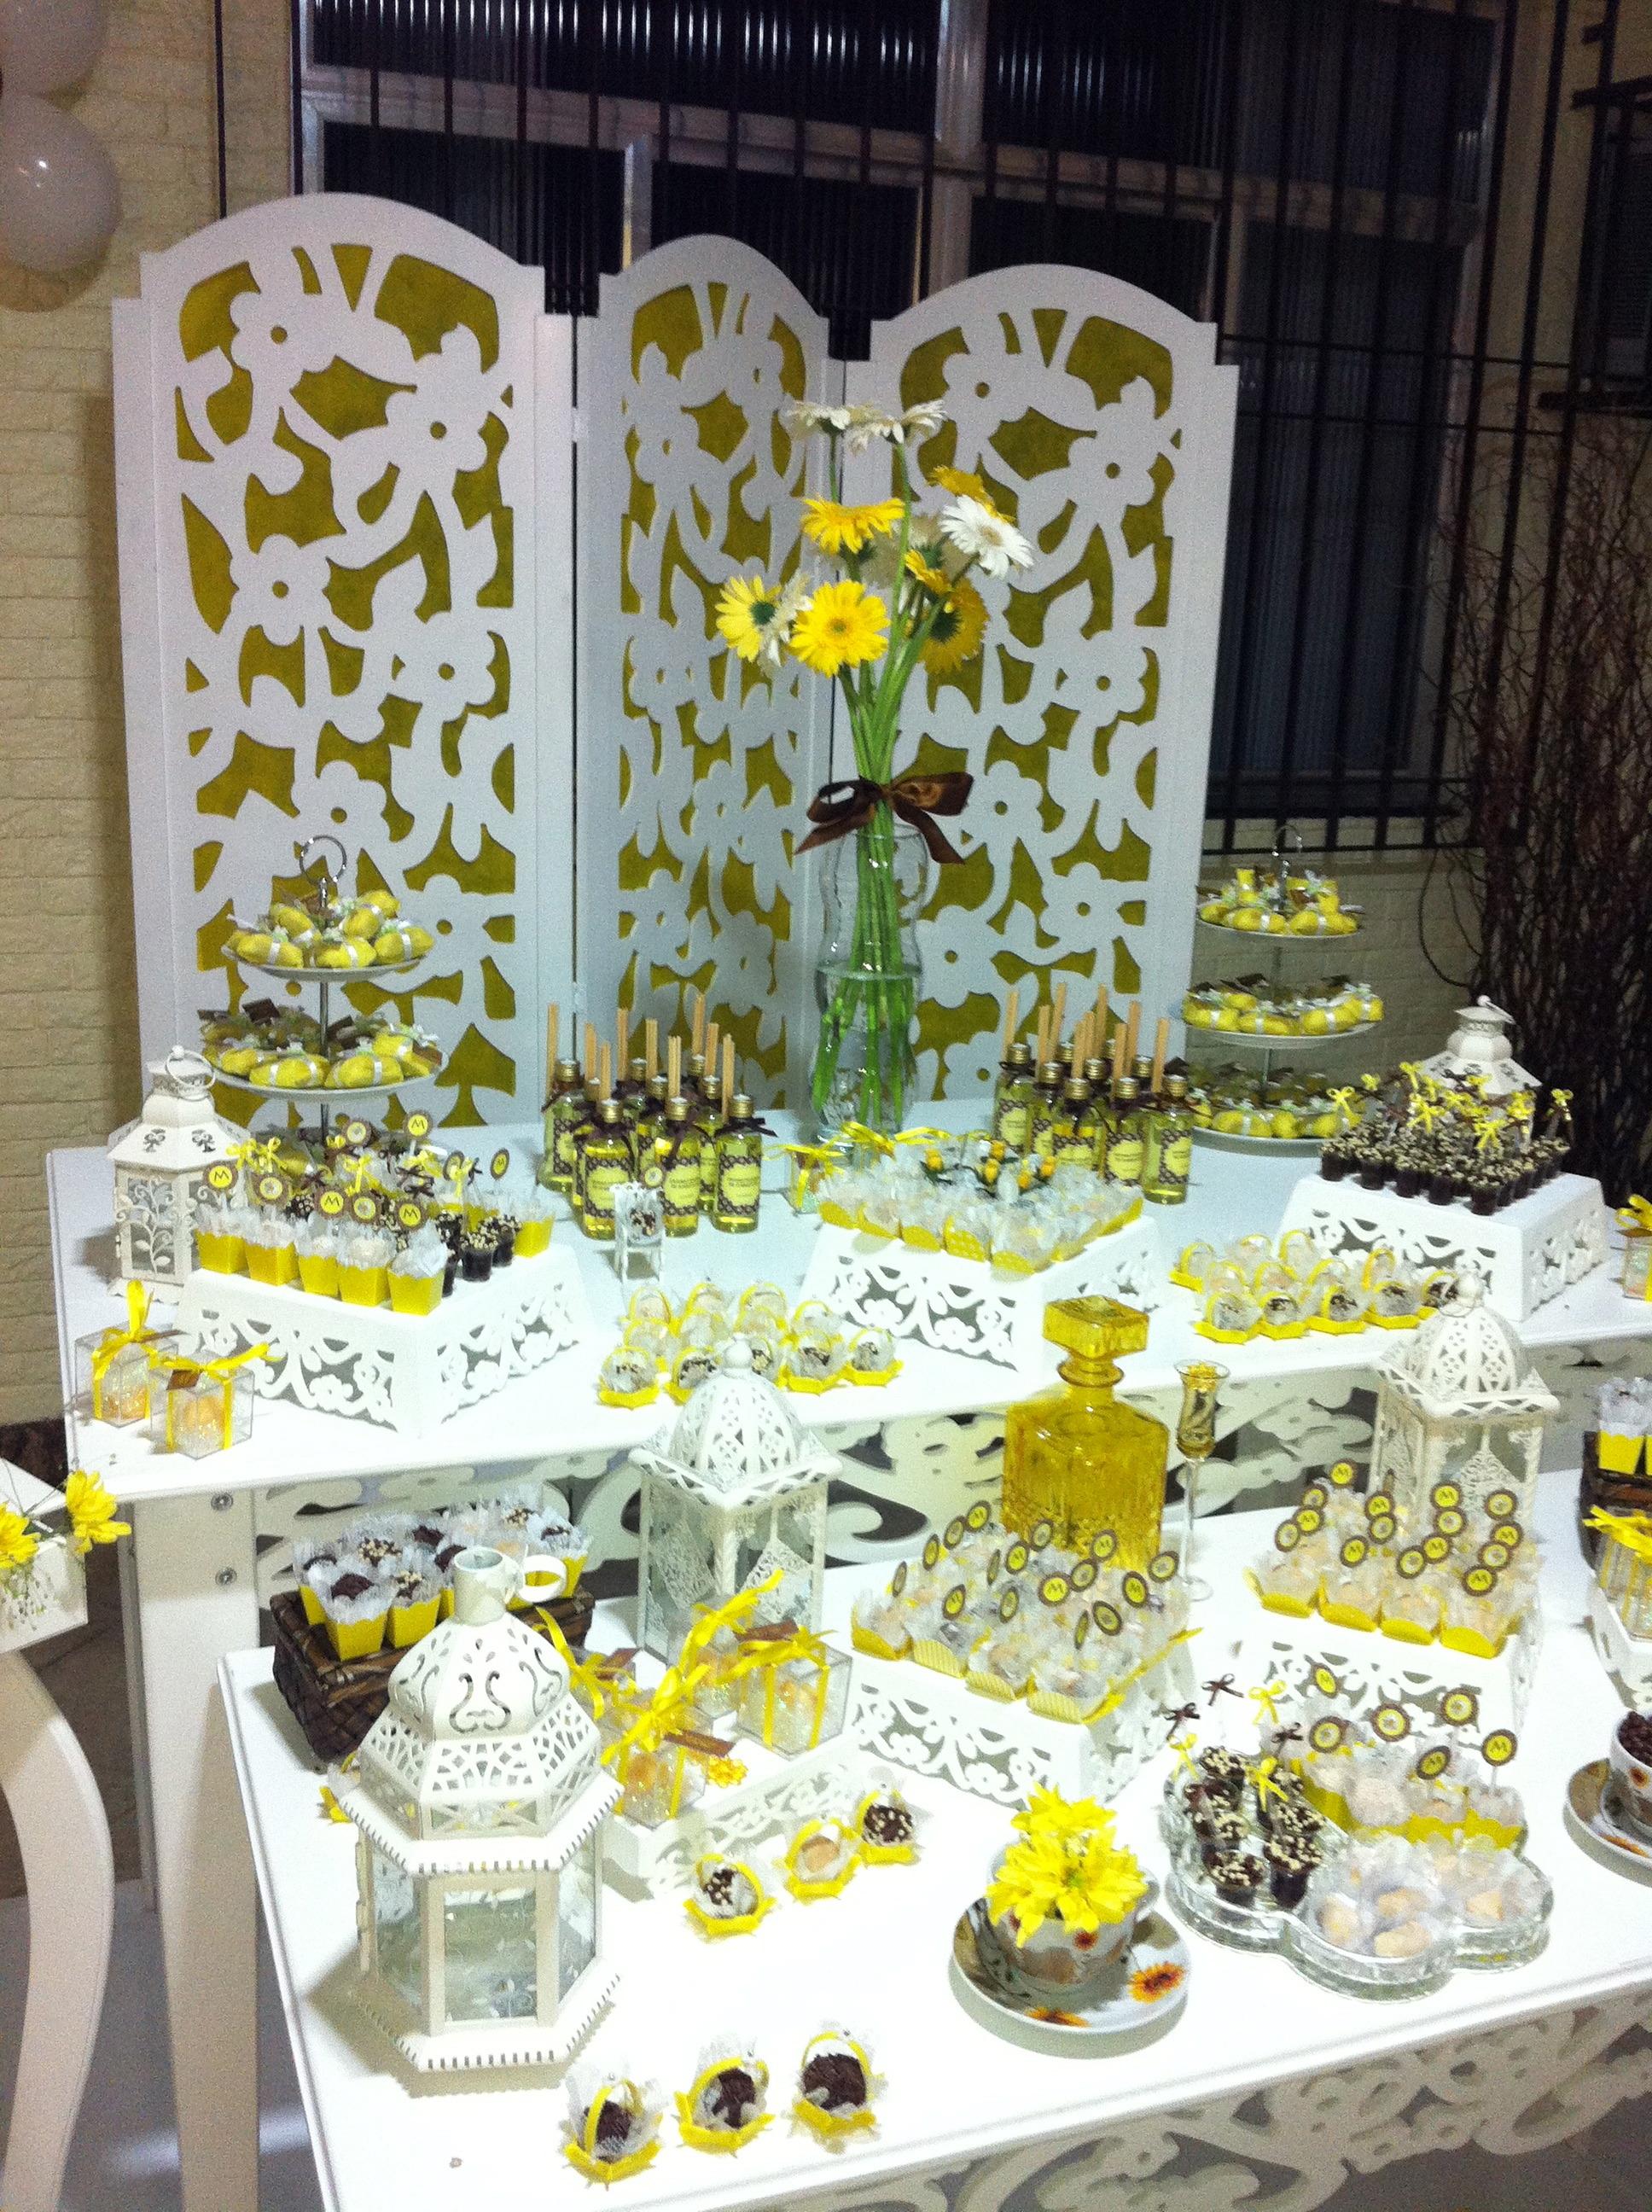 decoracao branco amarelo : decoracao branco amarelo:Provençal Amarelo e branco Decoração Provençal Amarelo e branco